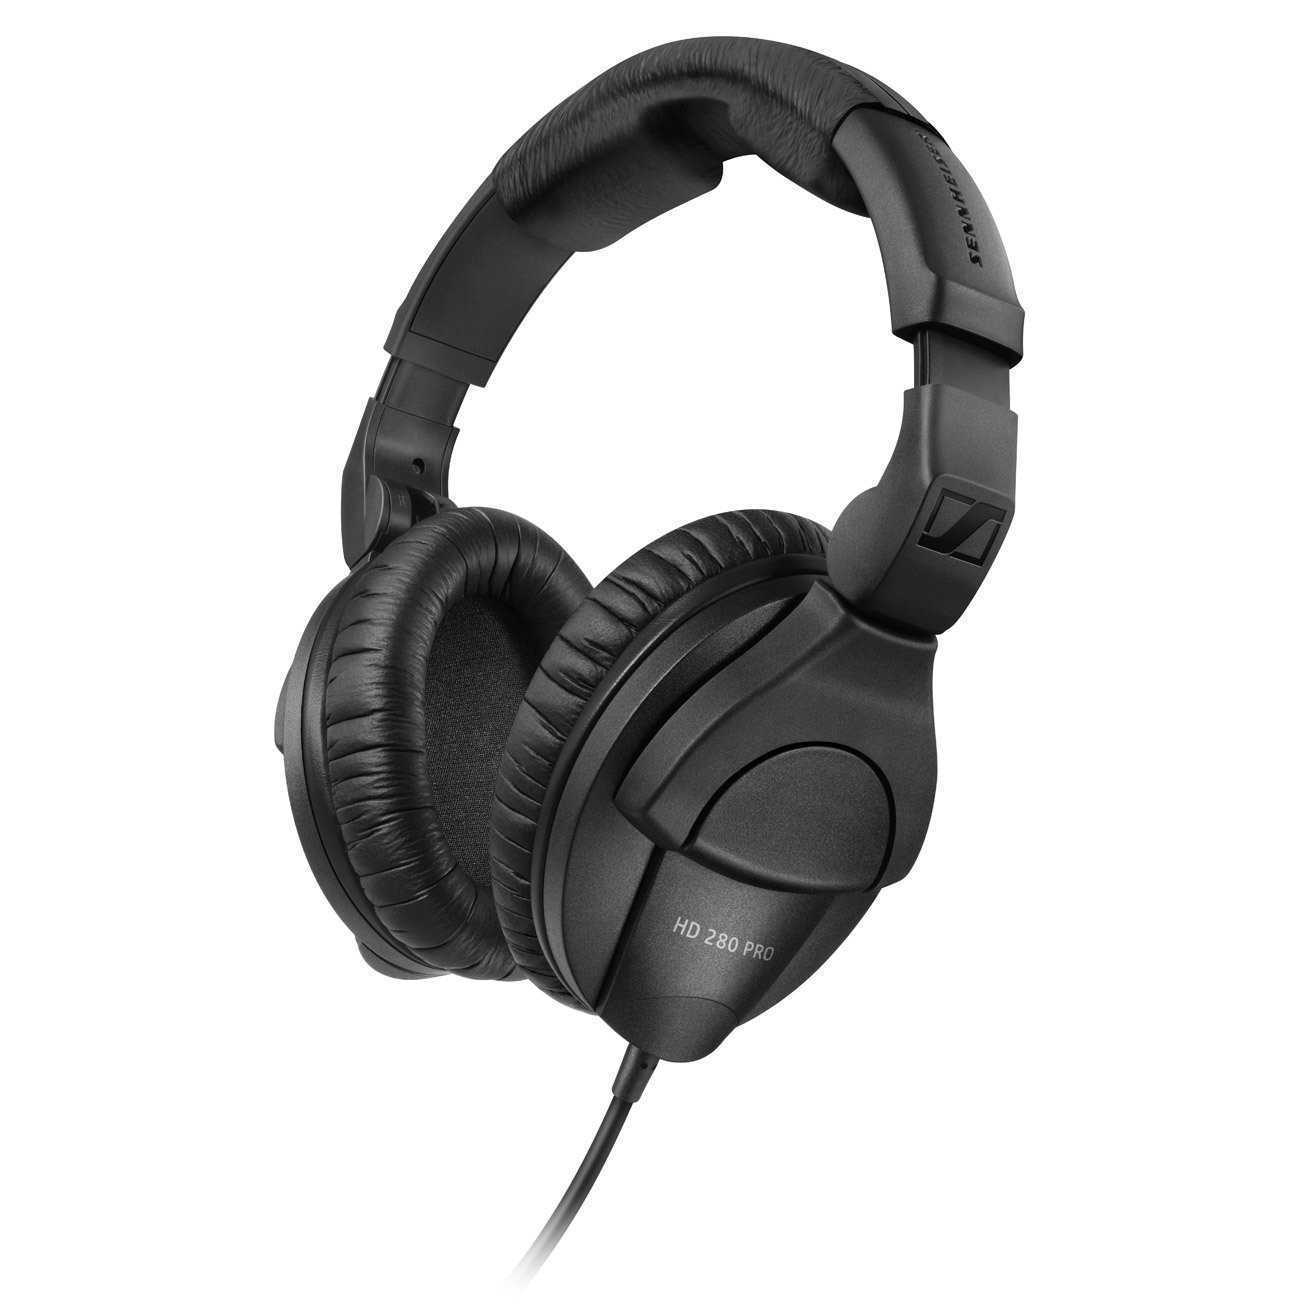 sennheiser HD 280 pro noise cancelling headphones